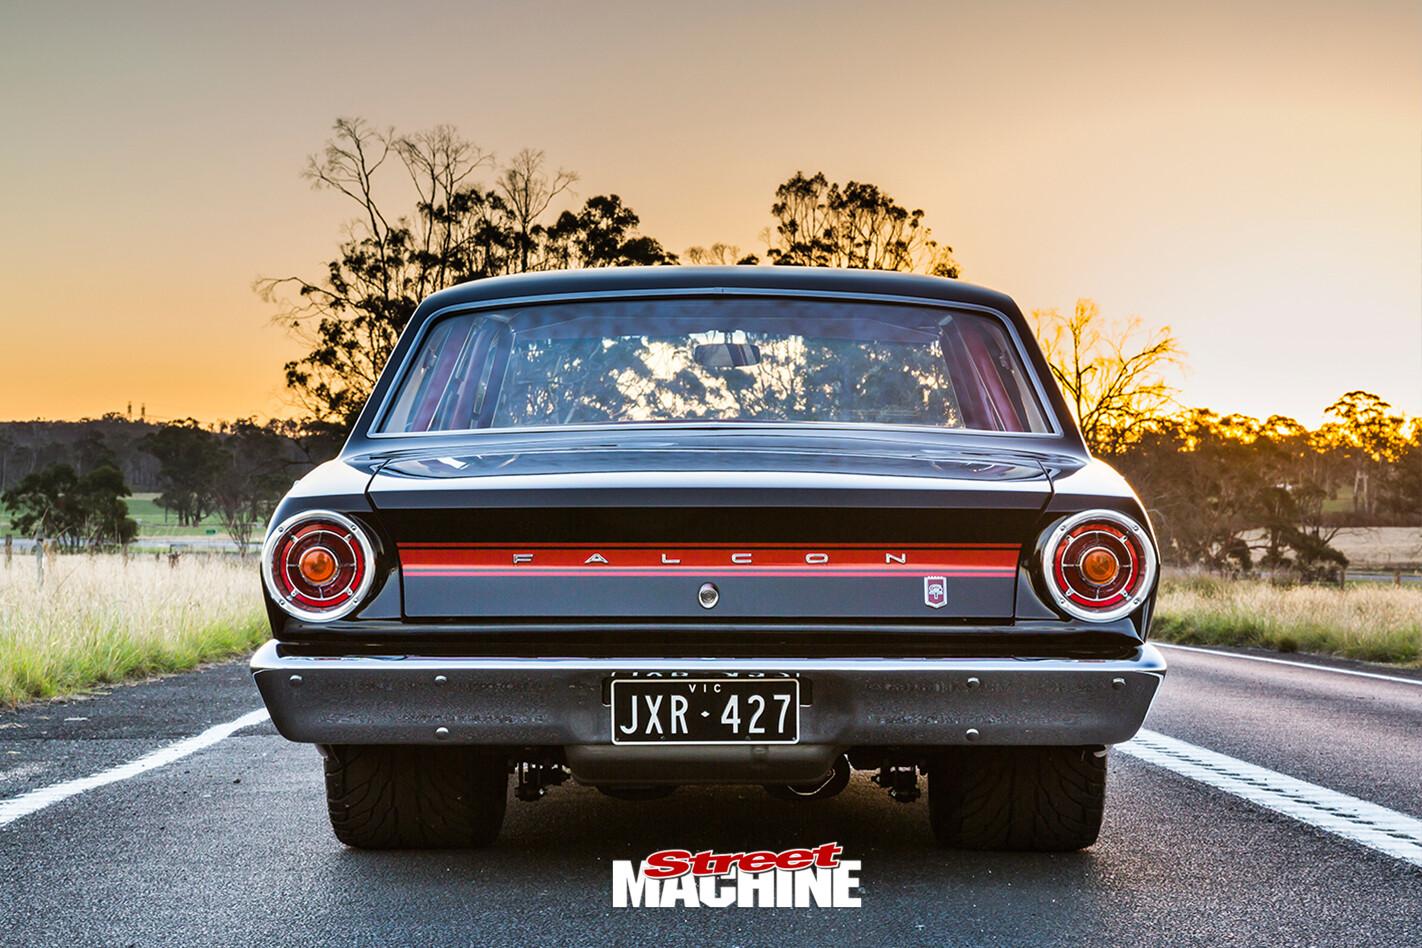 Ford -Falcon -XR-rear -view